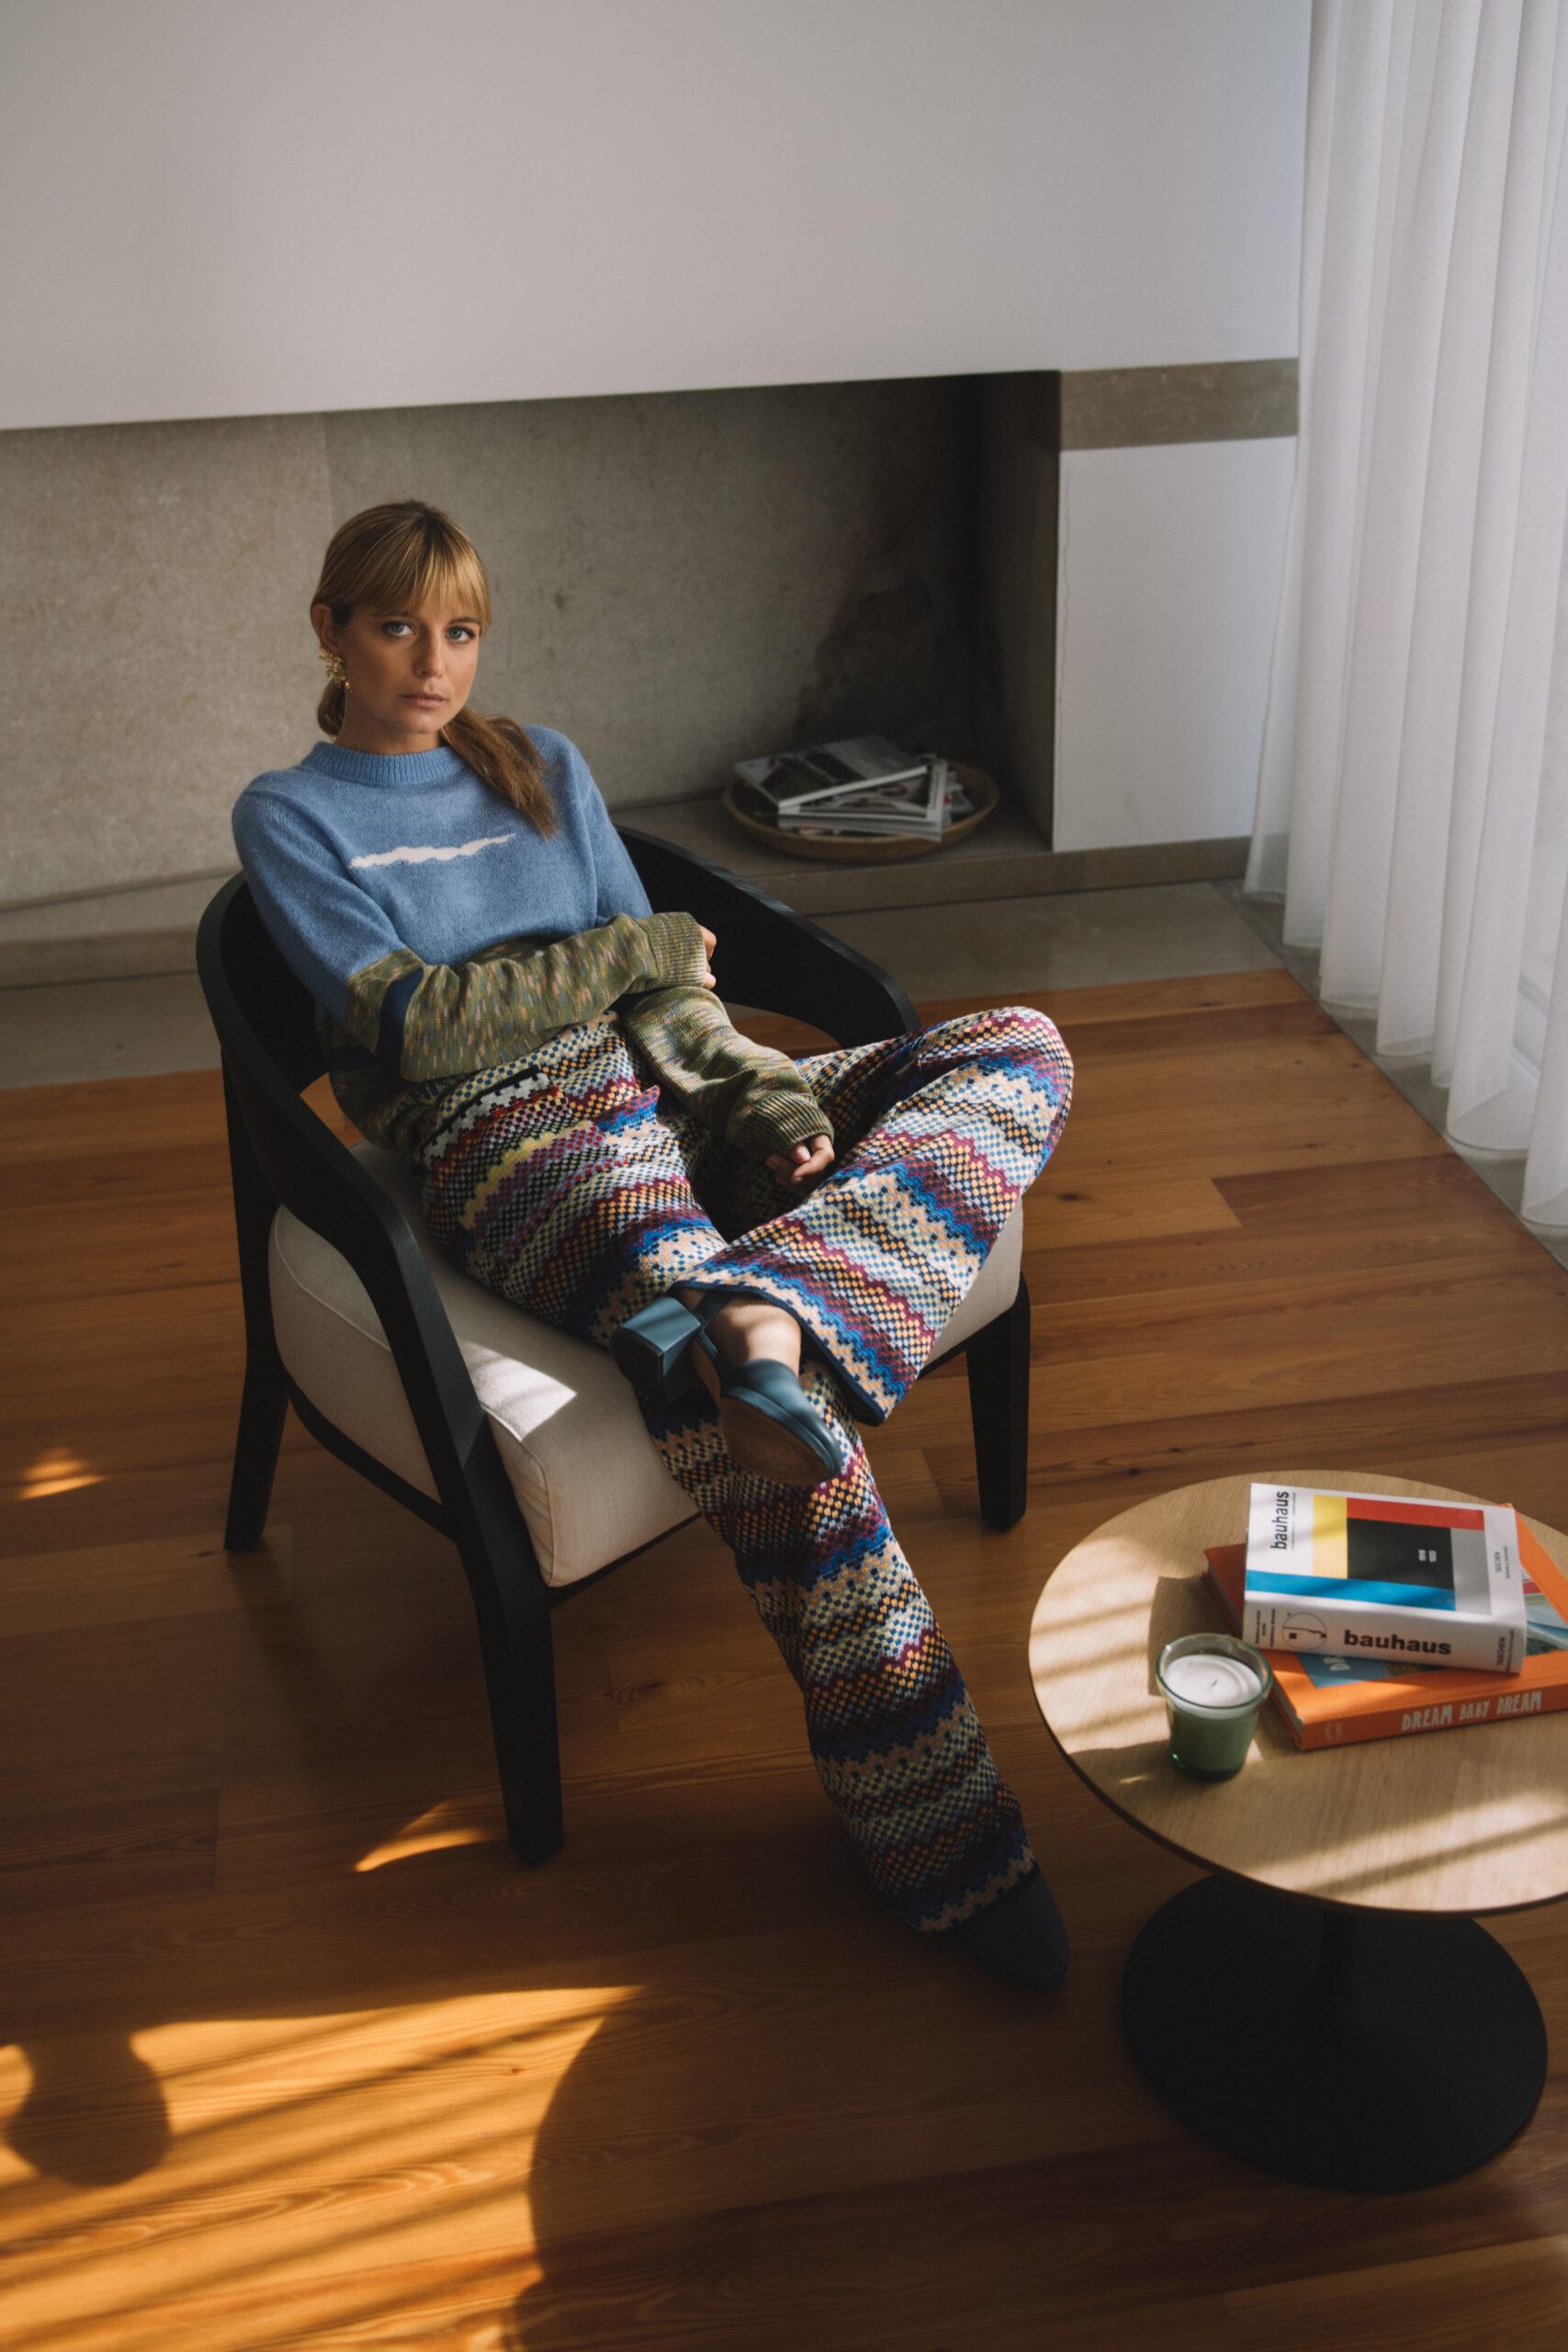 Cata Vassalo Styled by Daniela Gil